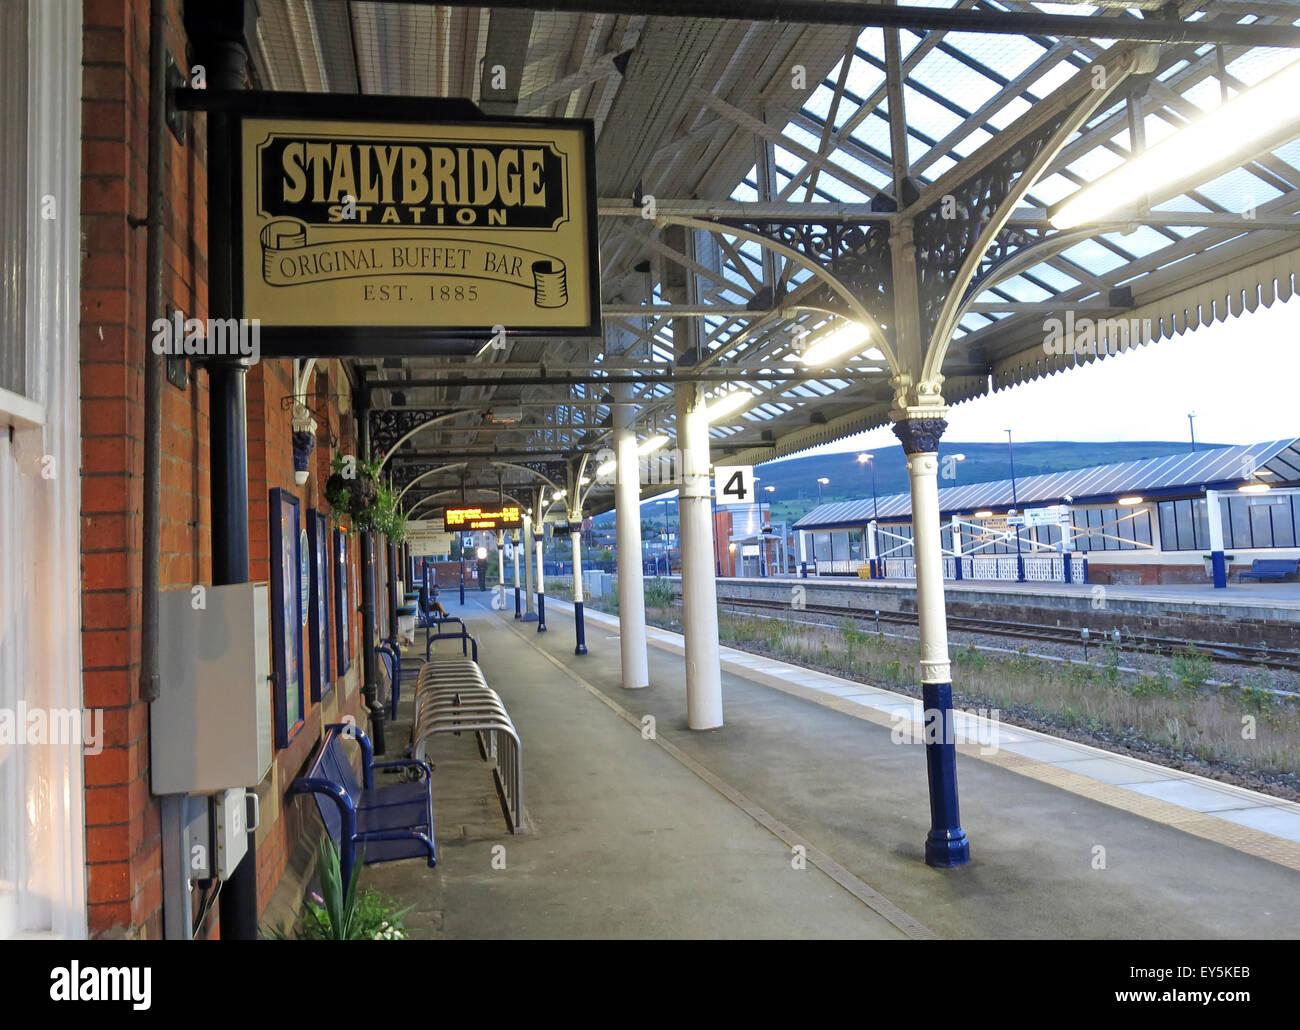 Laden Sie dieses Alamy Stockfoto Stalybridge Station Original Buffet Bar, est 1885, Transpennine Aletrail, Tameside, Greater Manchester, England, UK - EY5KEB